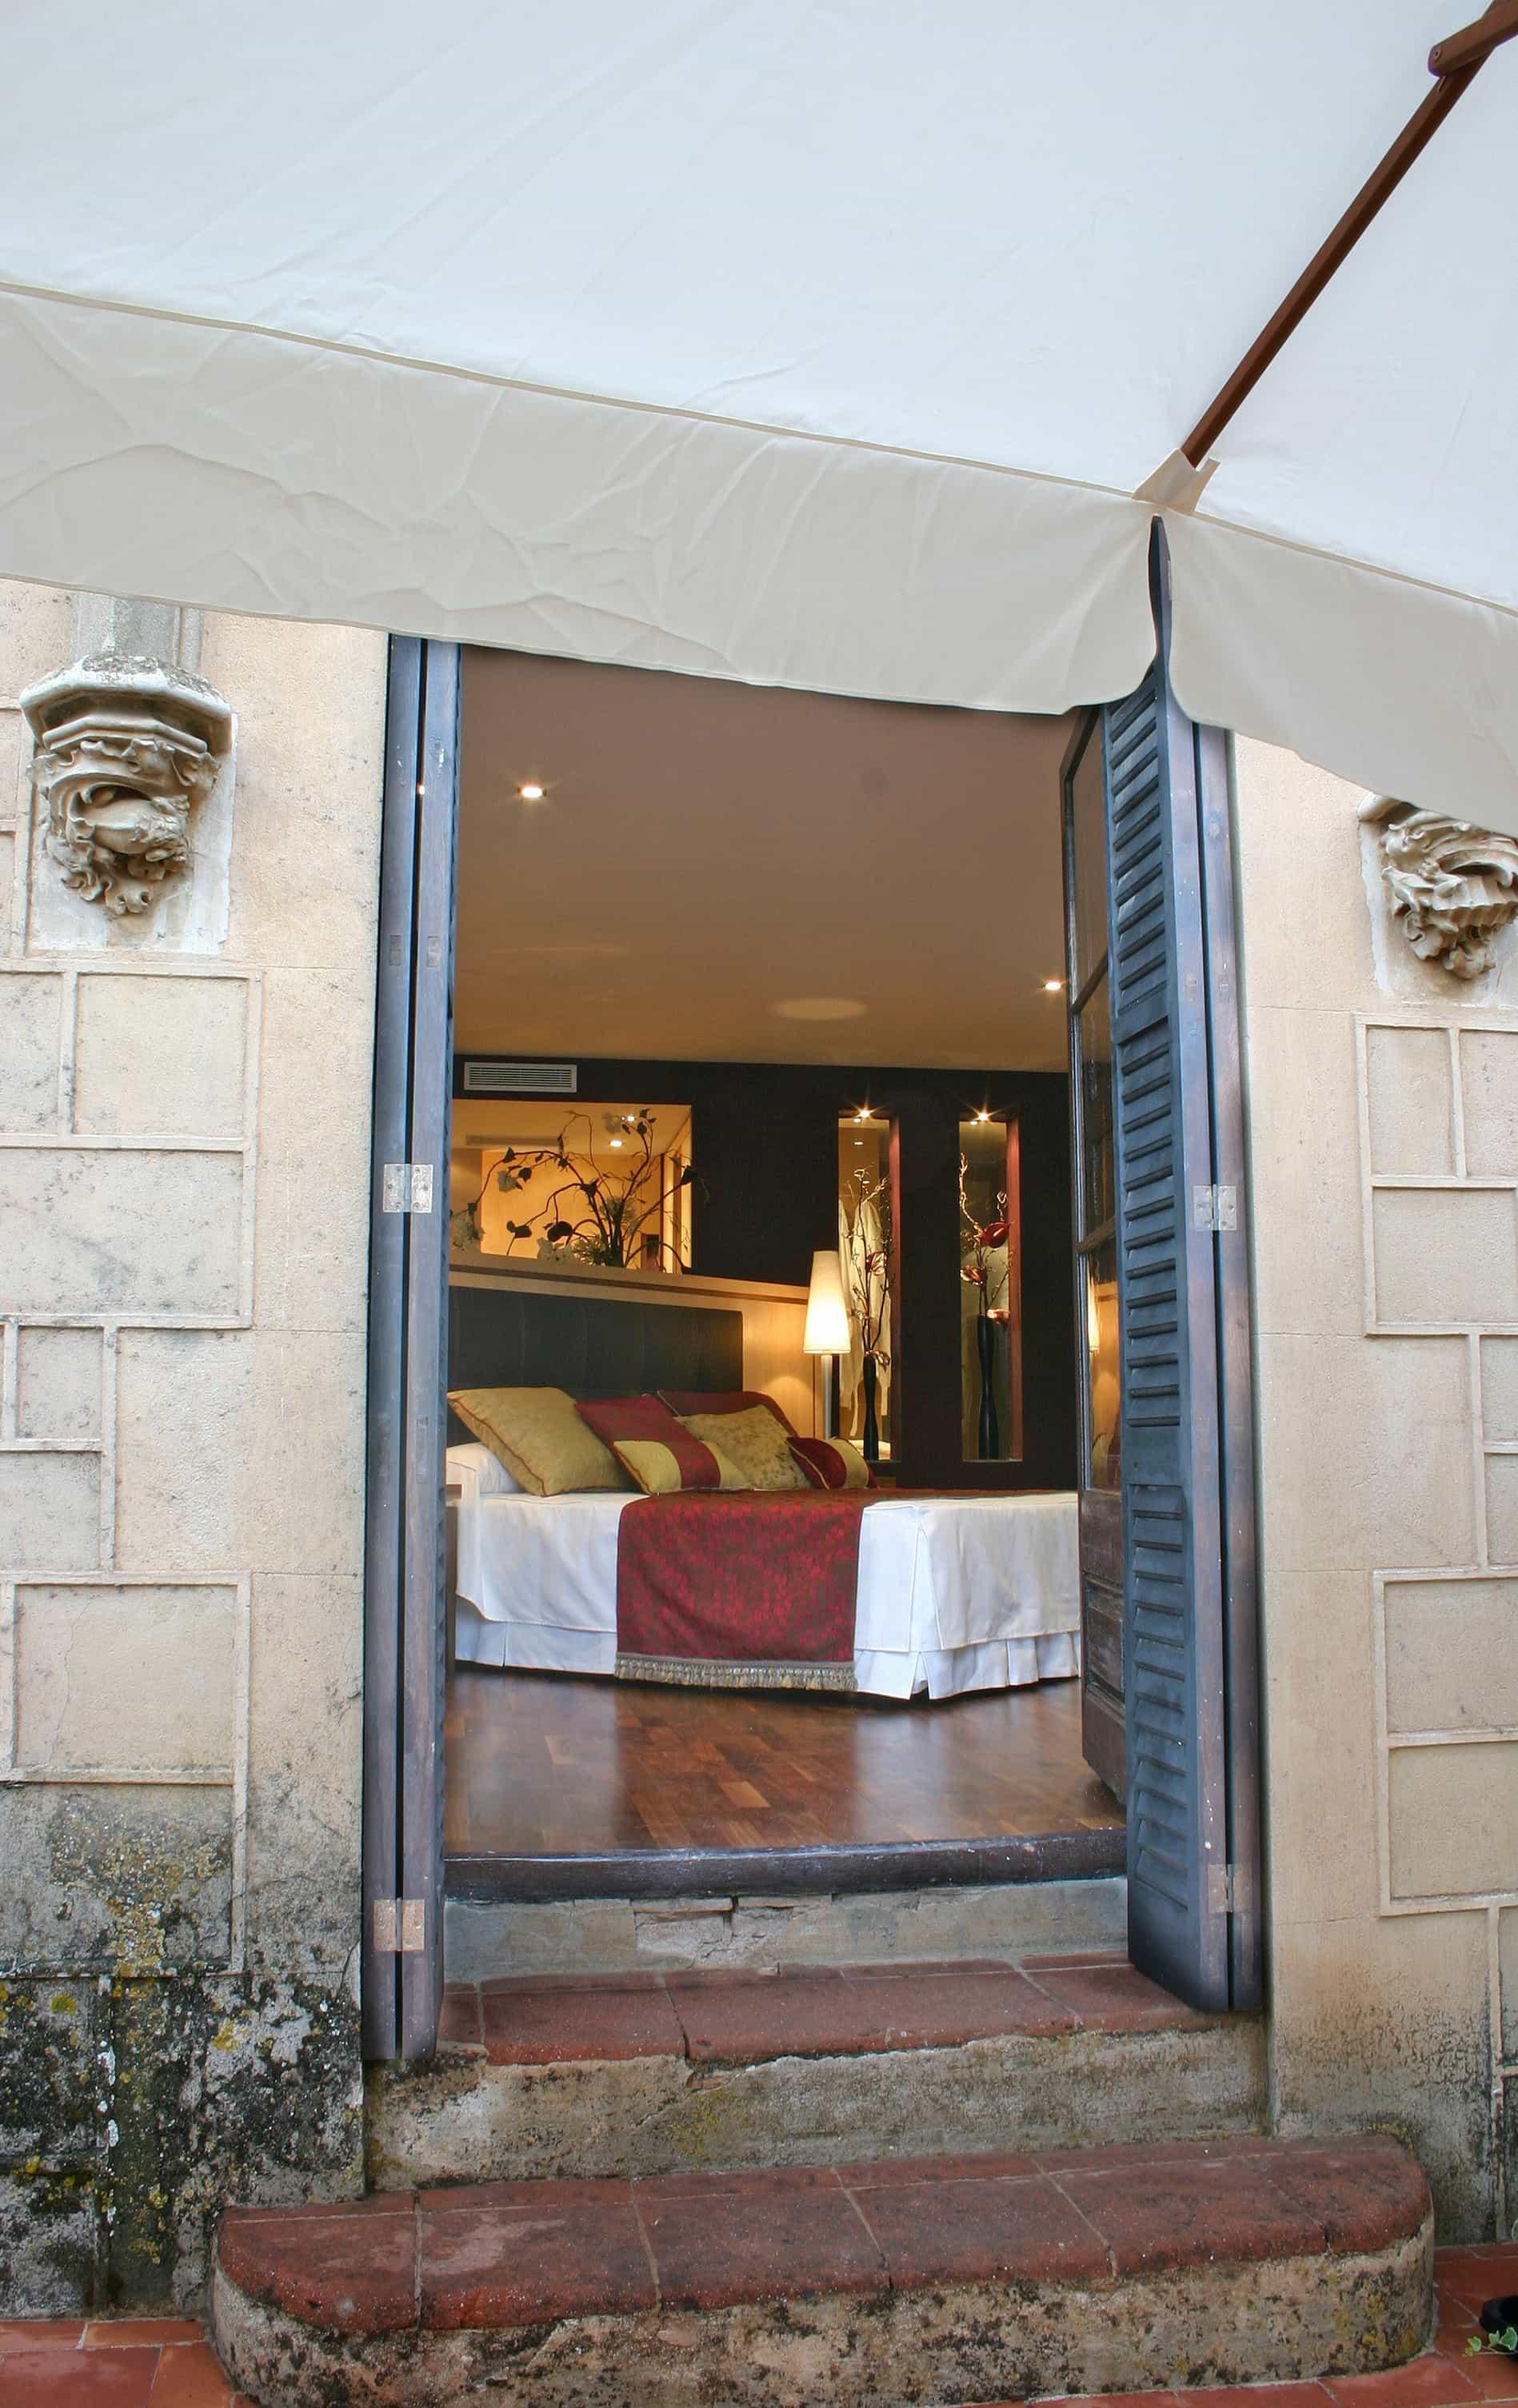 HOTEL ROOM BARCELONA by ROSA COLET INTERIOR DESIGN